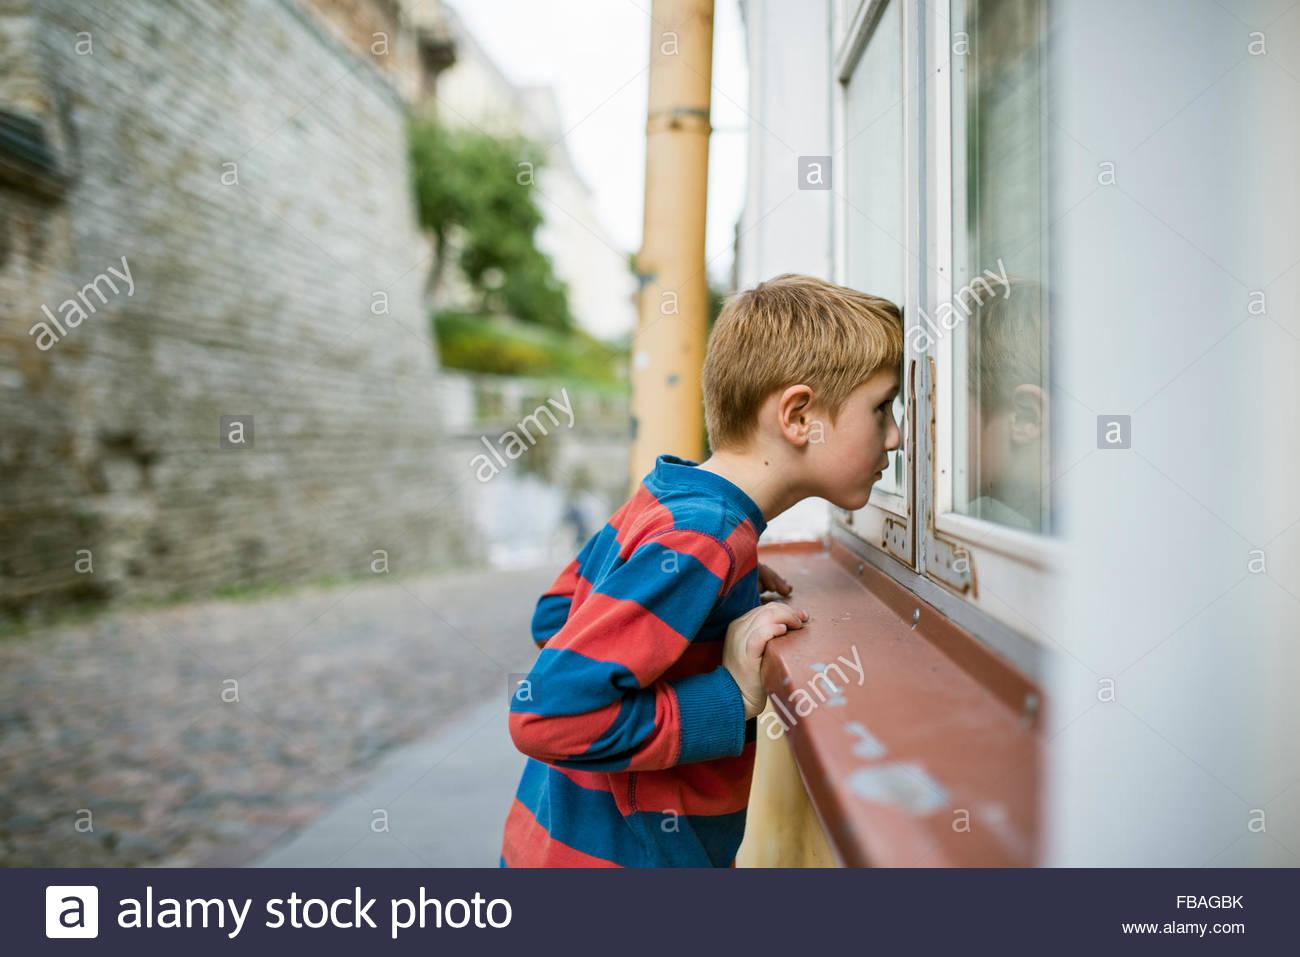 Estonia, Tallinn, Boy (6-7) looking into house through window - Stock Image